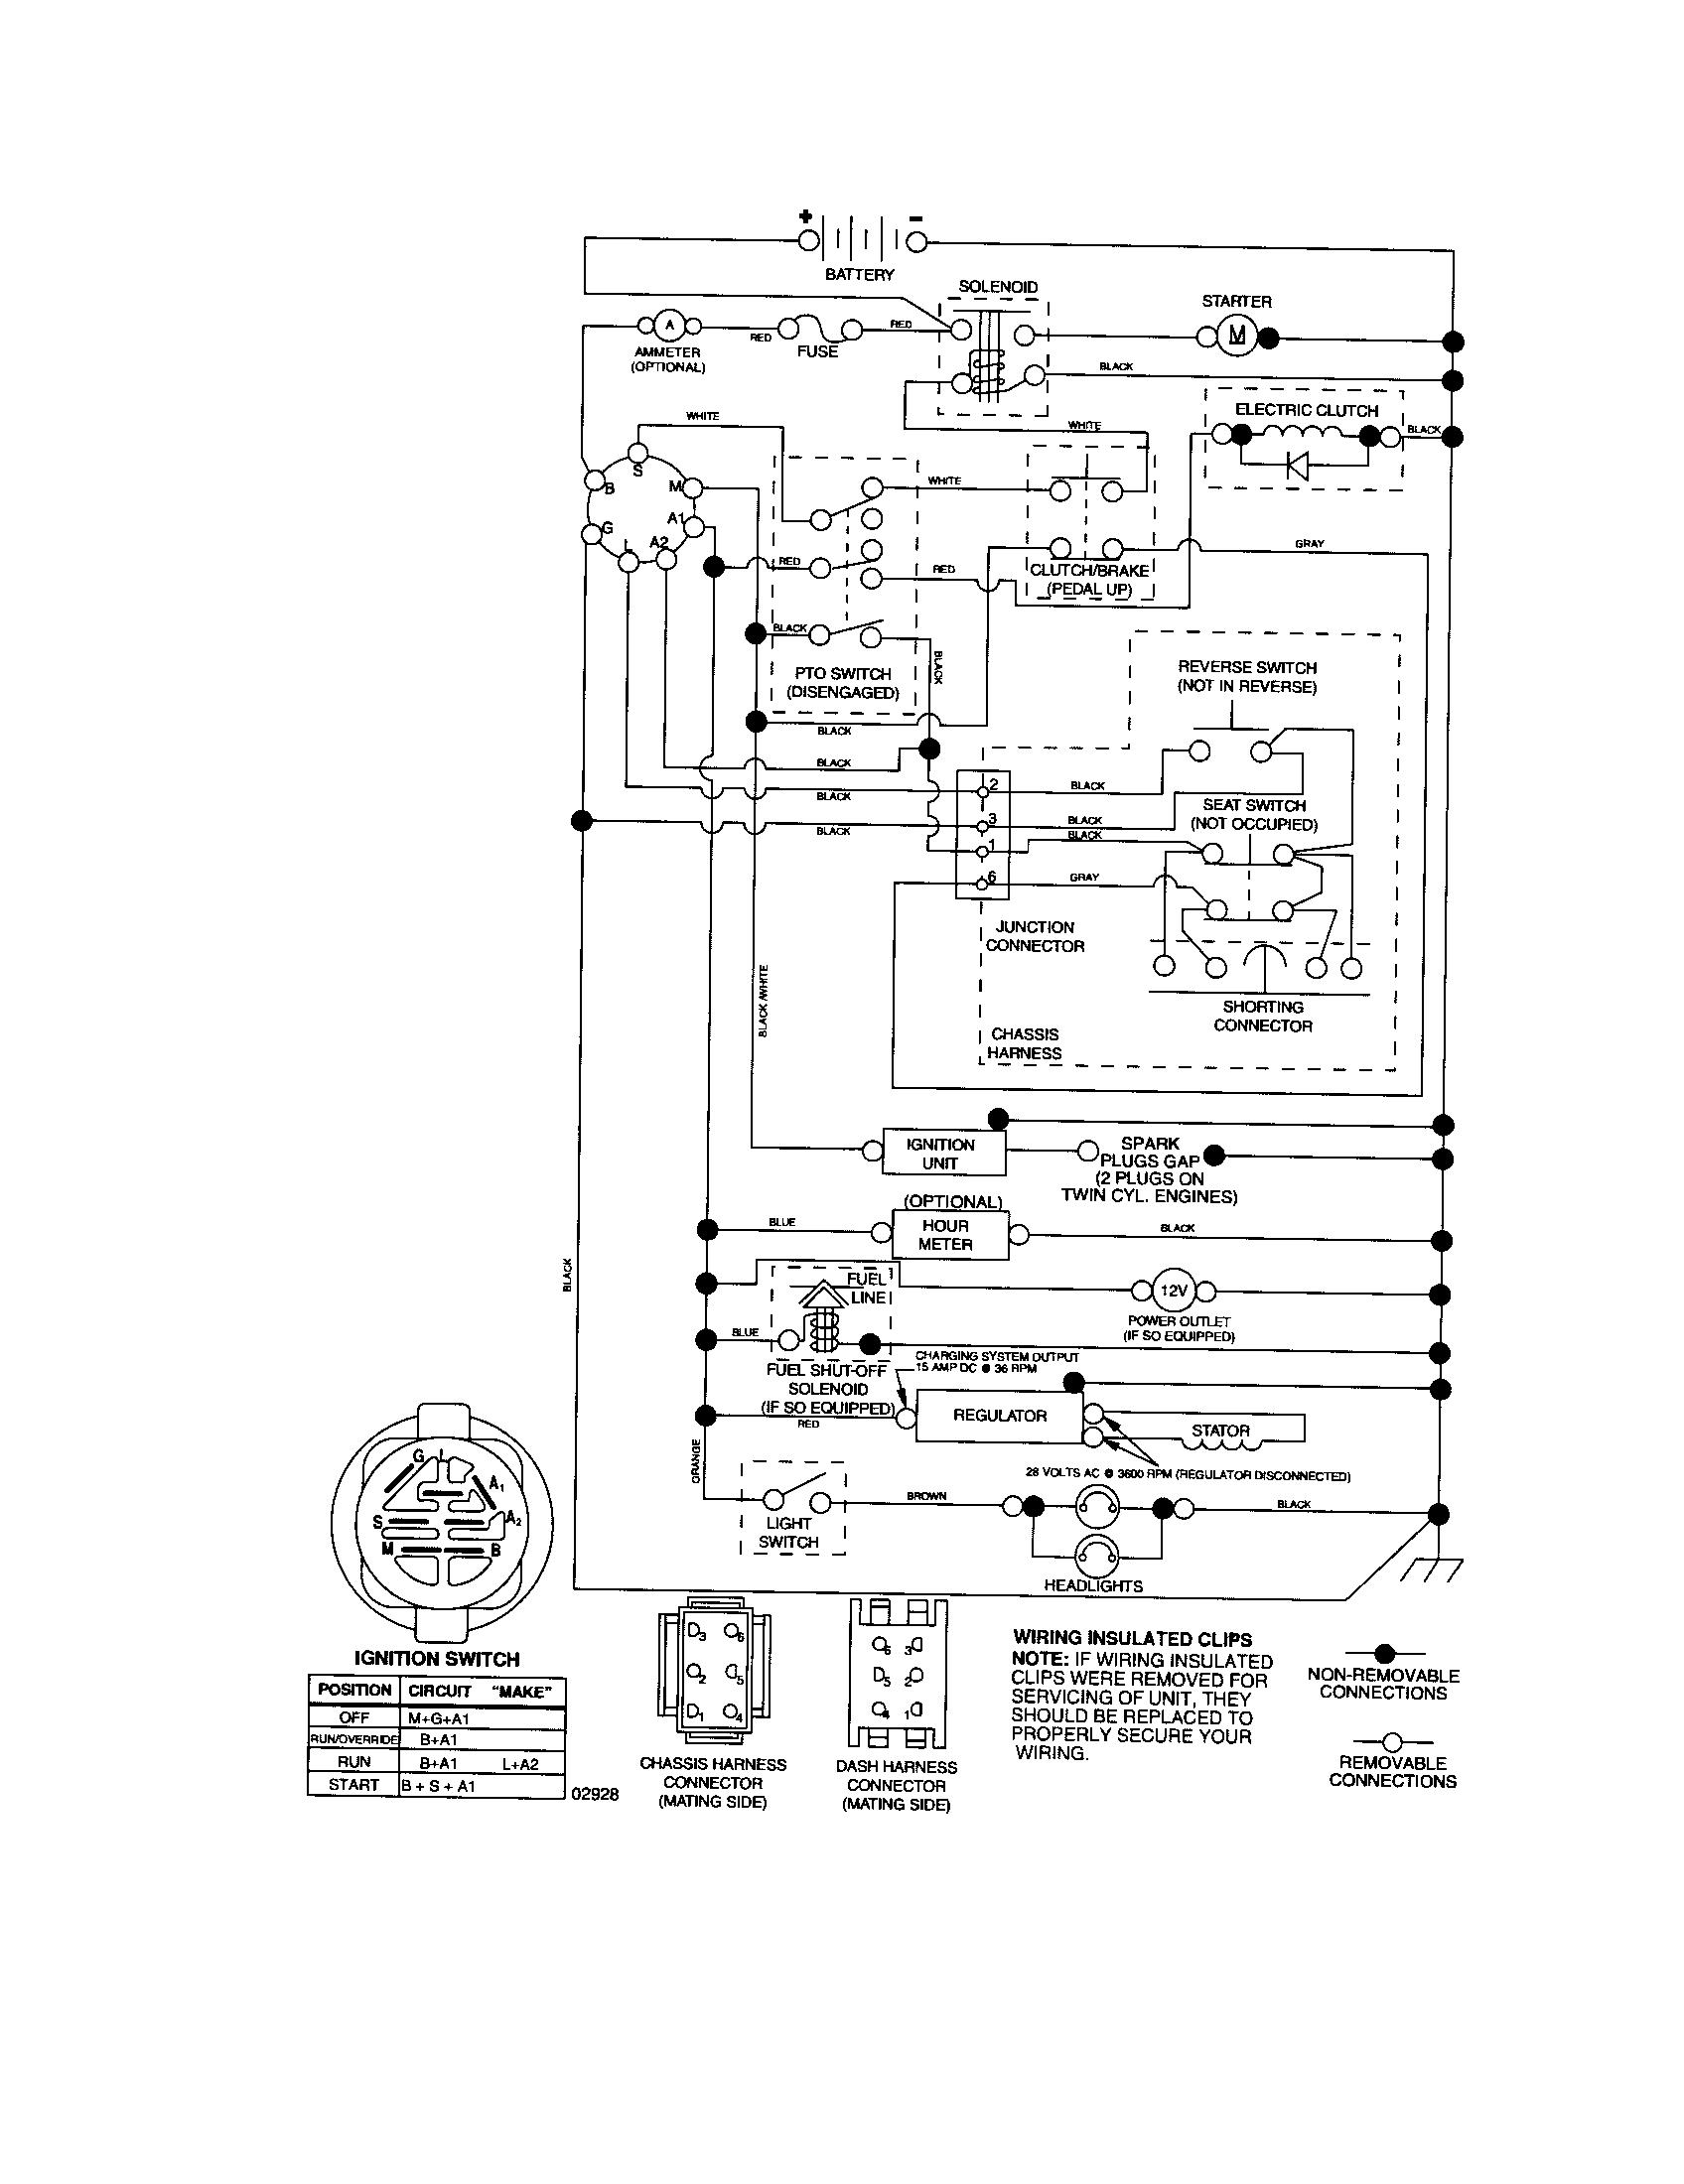 hight resolution of ford alternator wiring diagram internal regulator wiring diagramhj75 alternator wiring diagram wiring diagram database